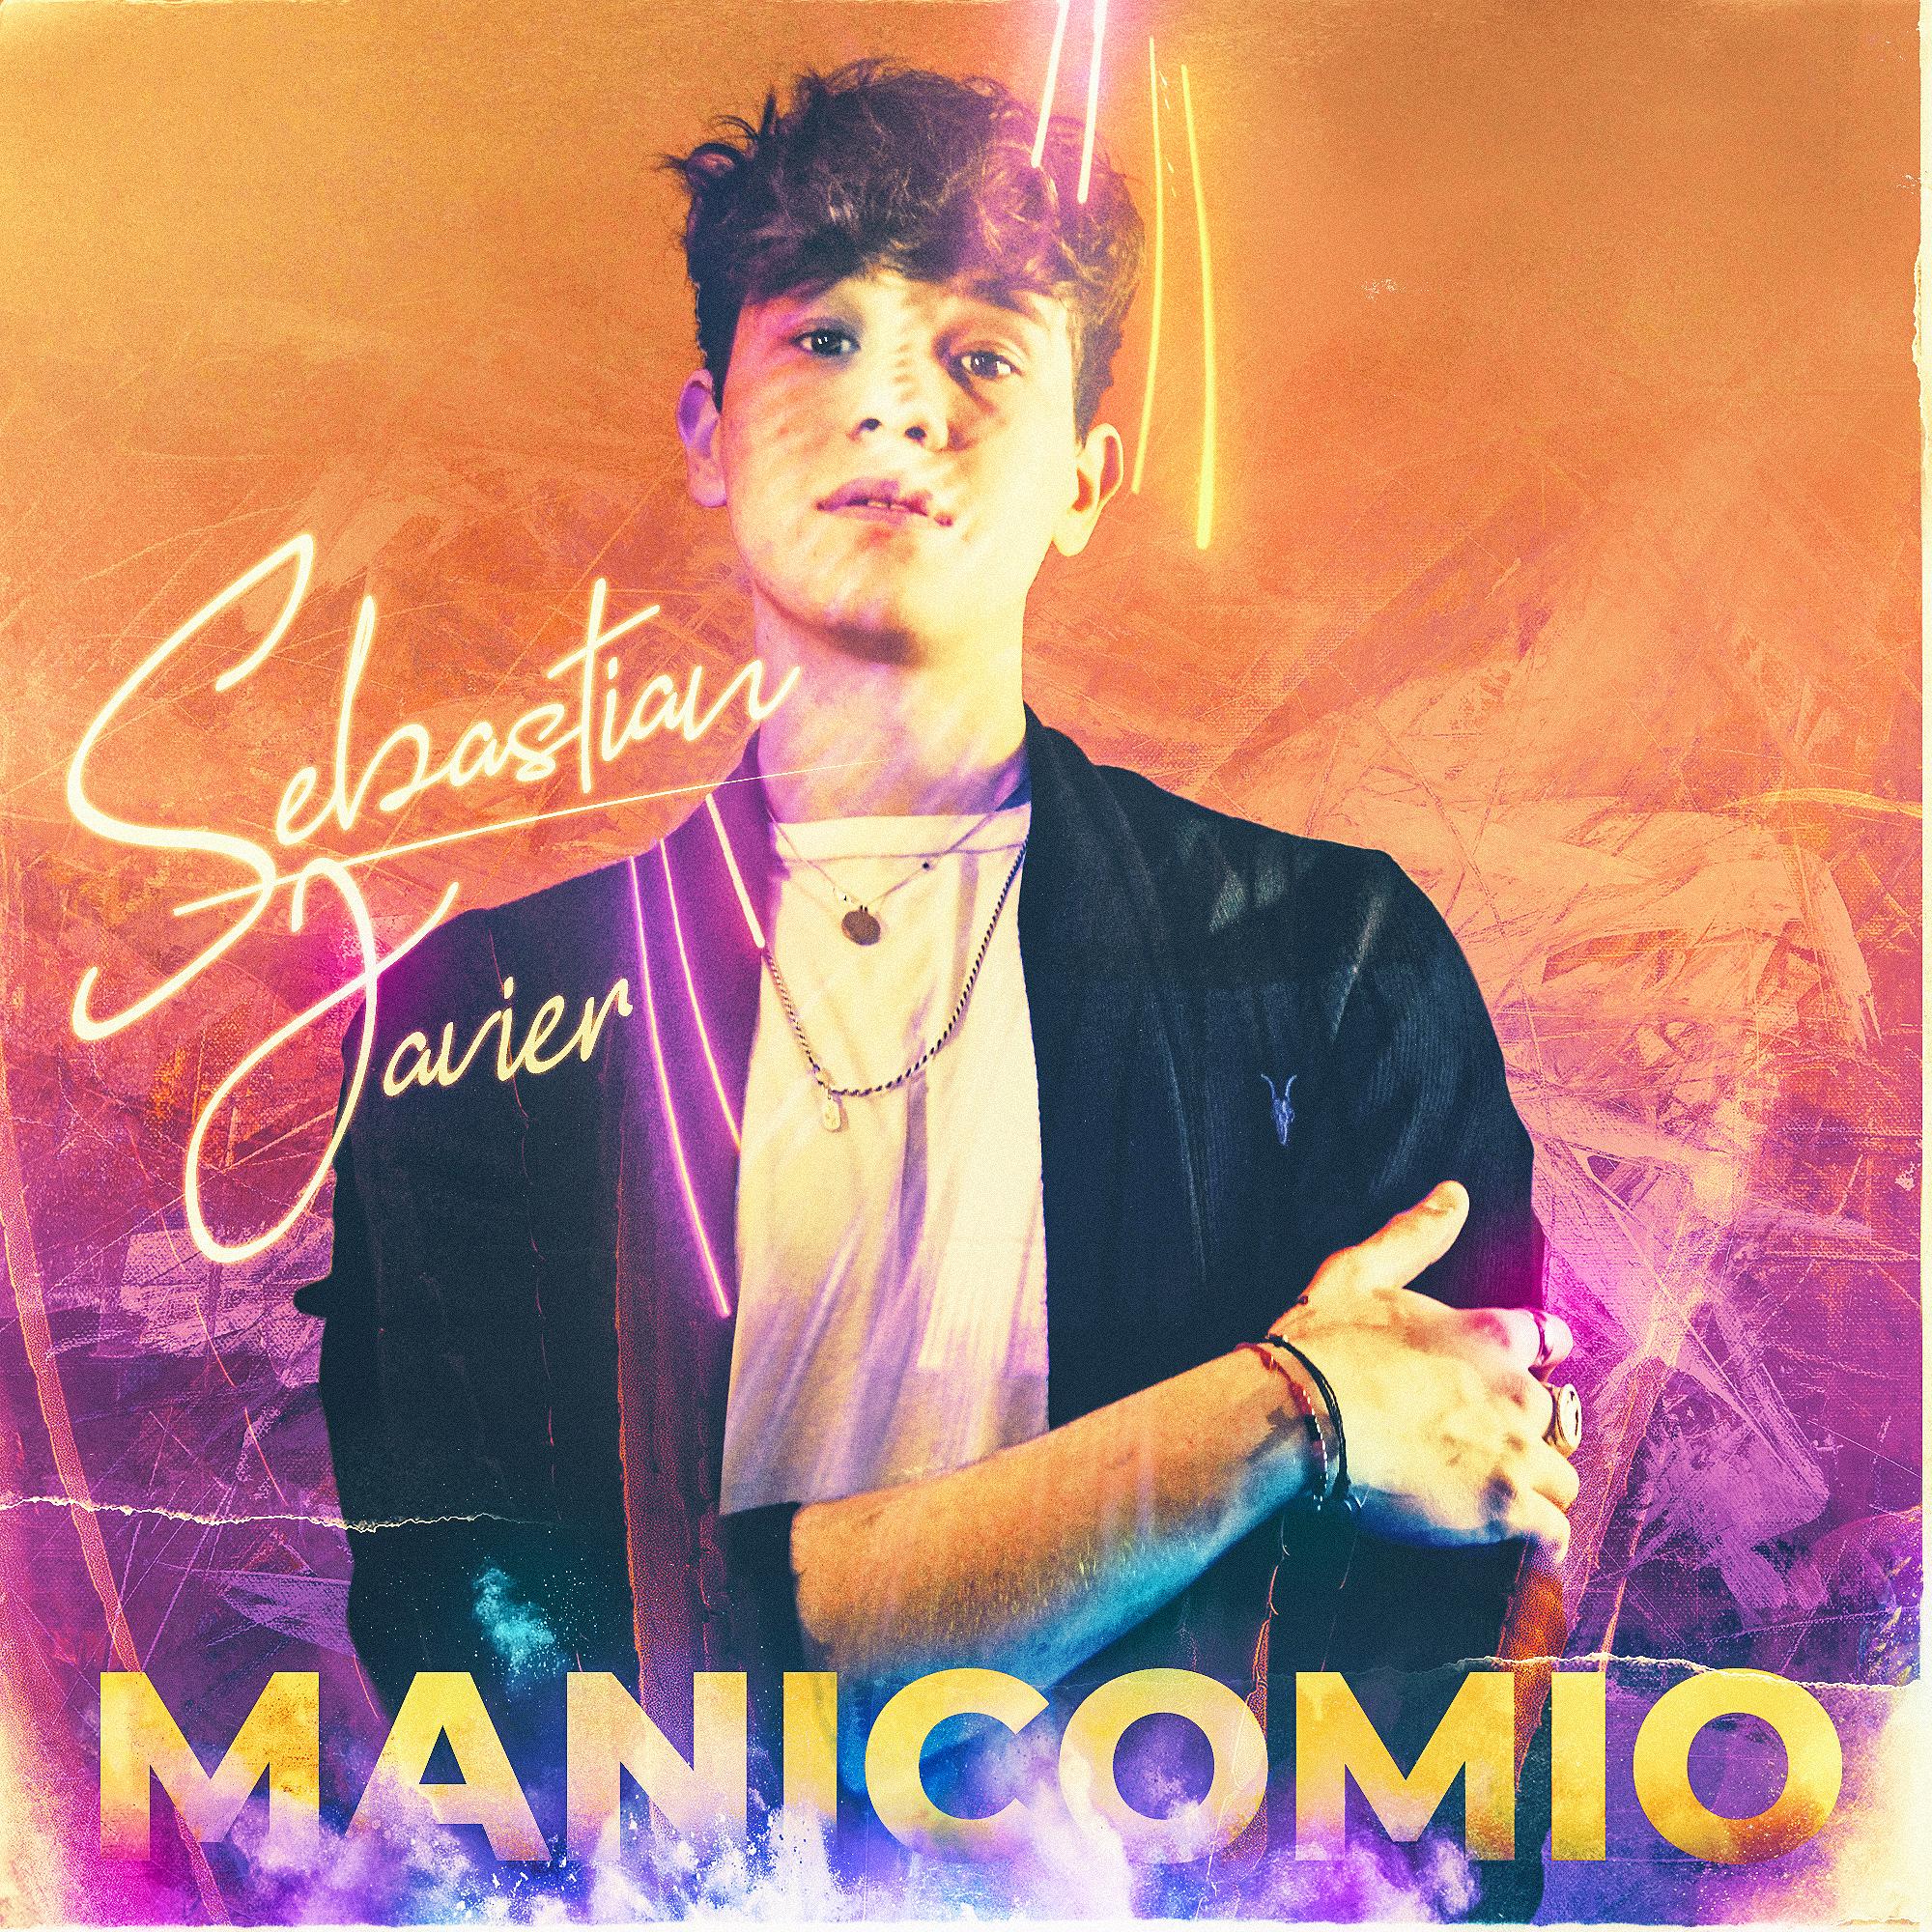 Sebastian Javier Releases Debut Single + Video Manicomio - April 11, 2019